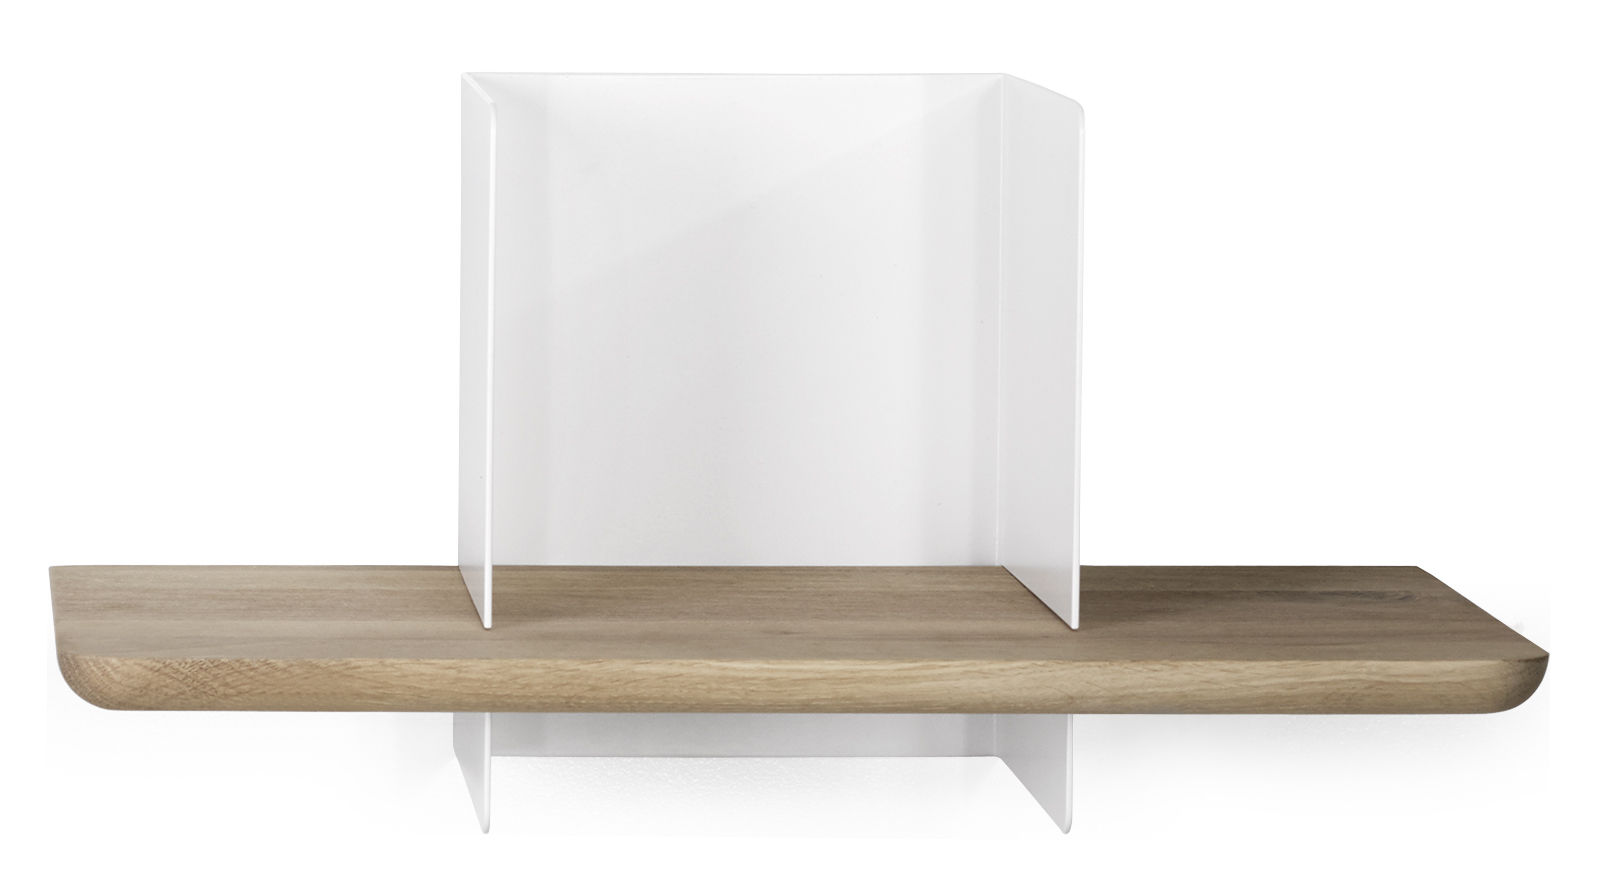 etag re clip small l 50 cm ch ne naturel blanc. Black Bedroom Furniture Sets. Home Design Ideas